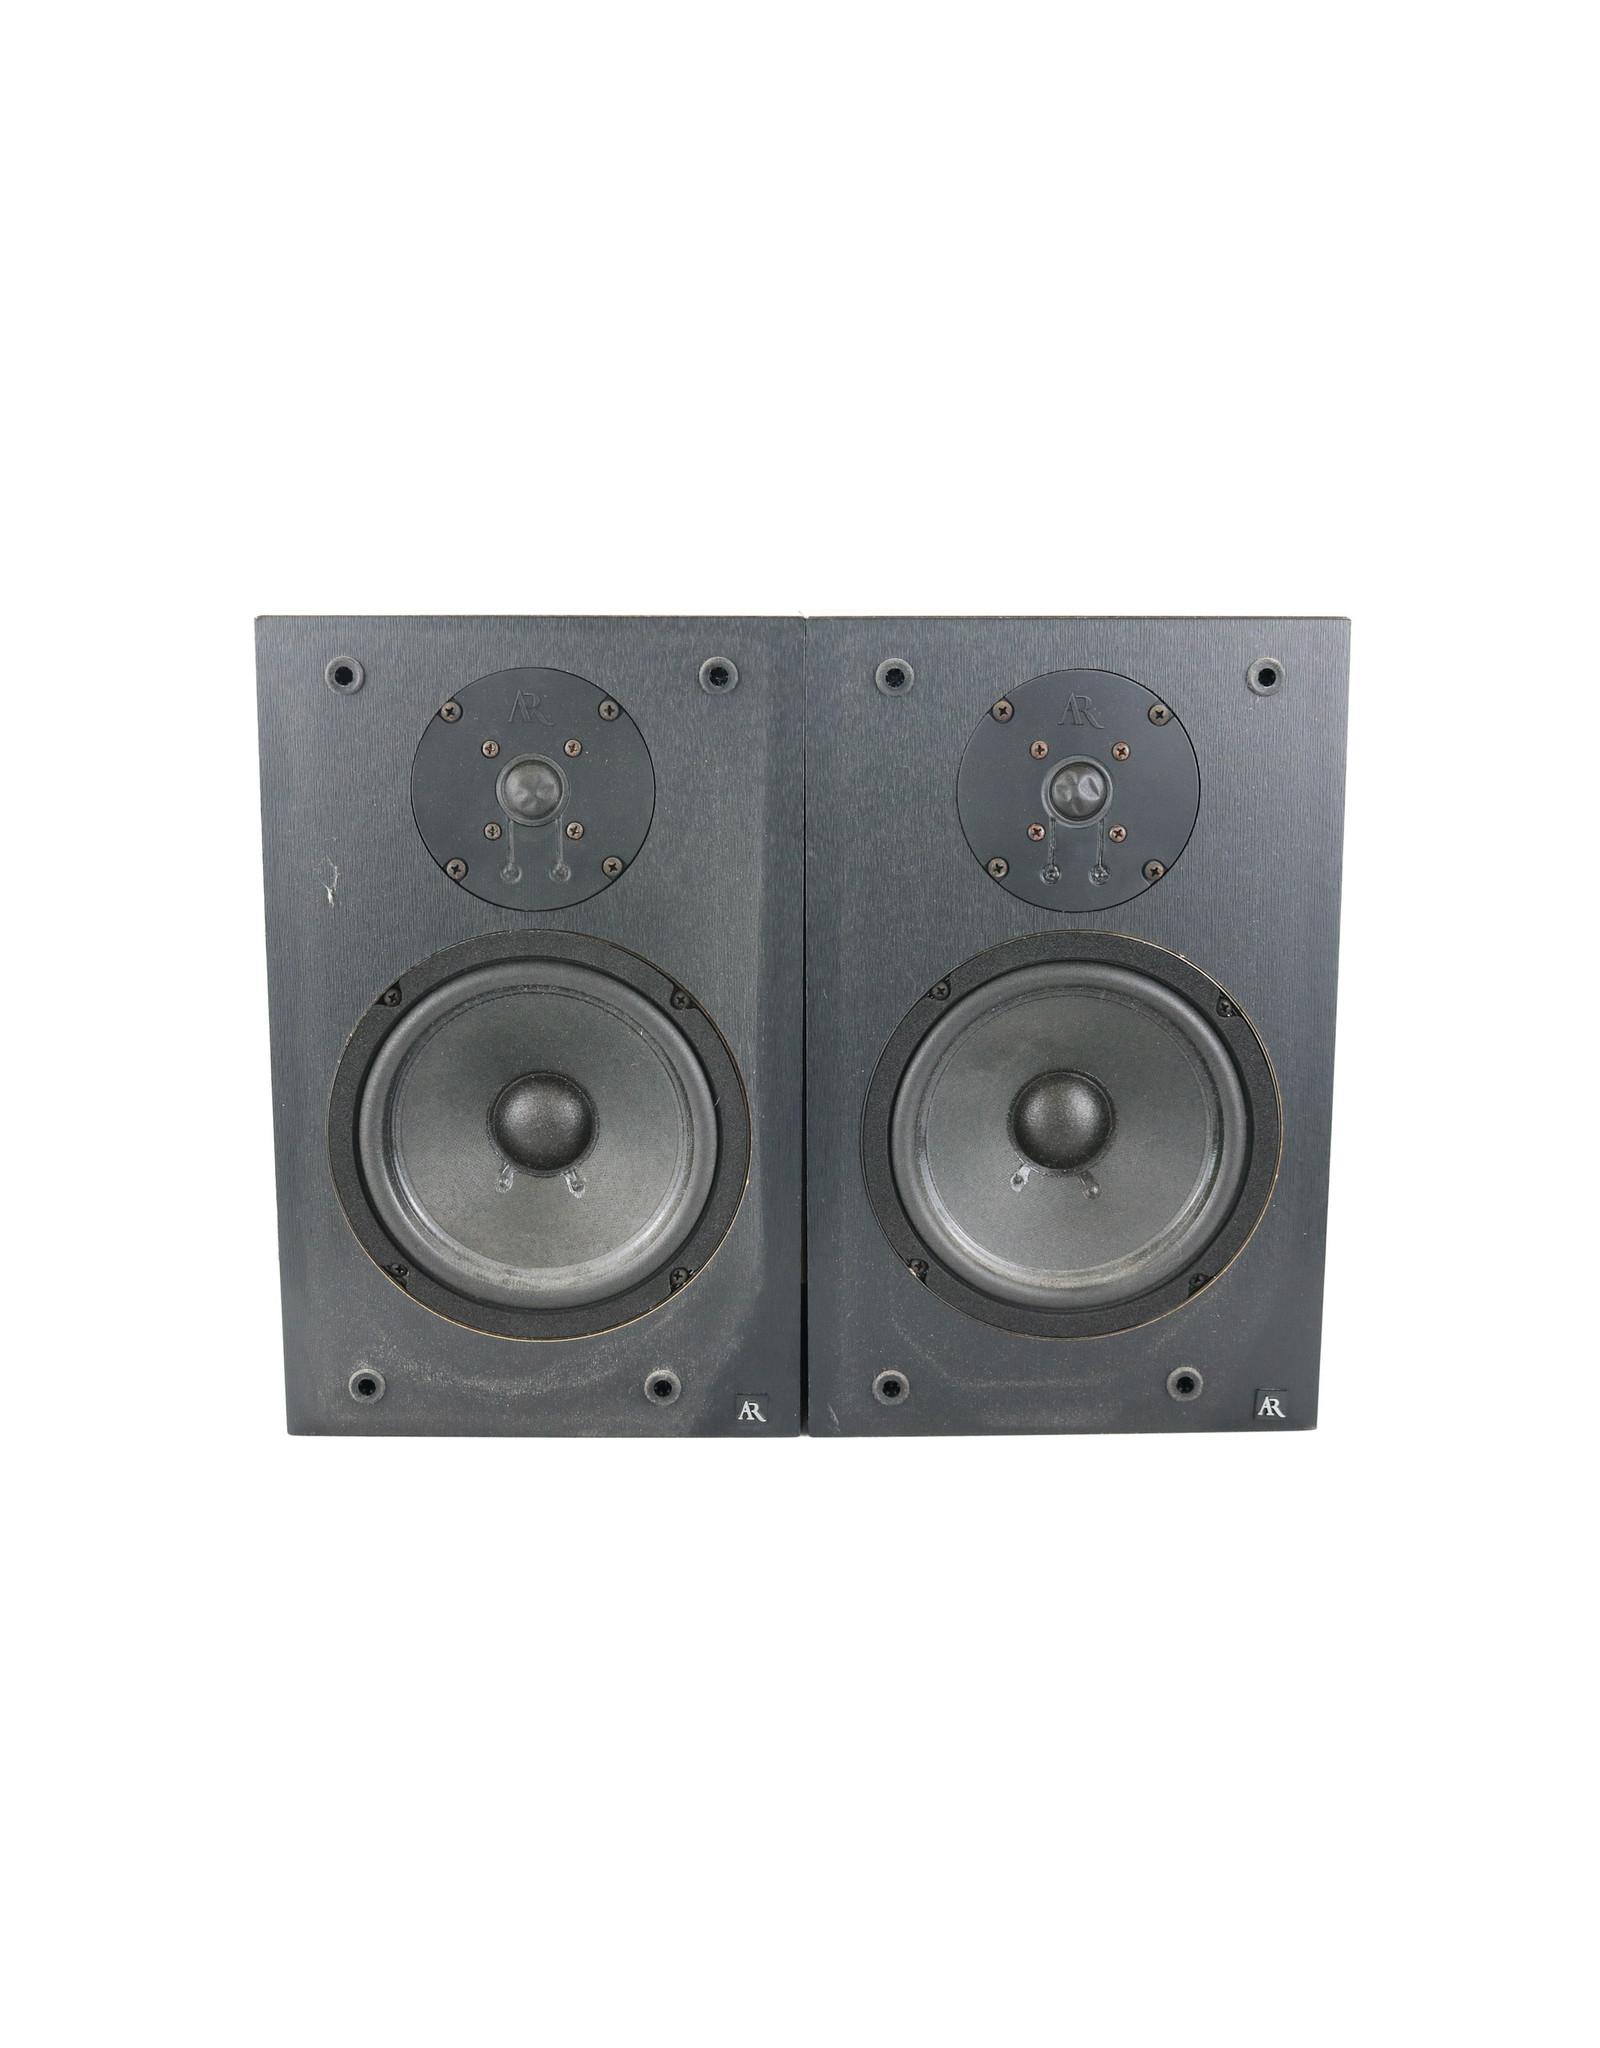 AR Acoustic Research 218V Bookshelf Speakers USED